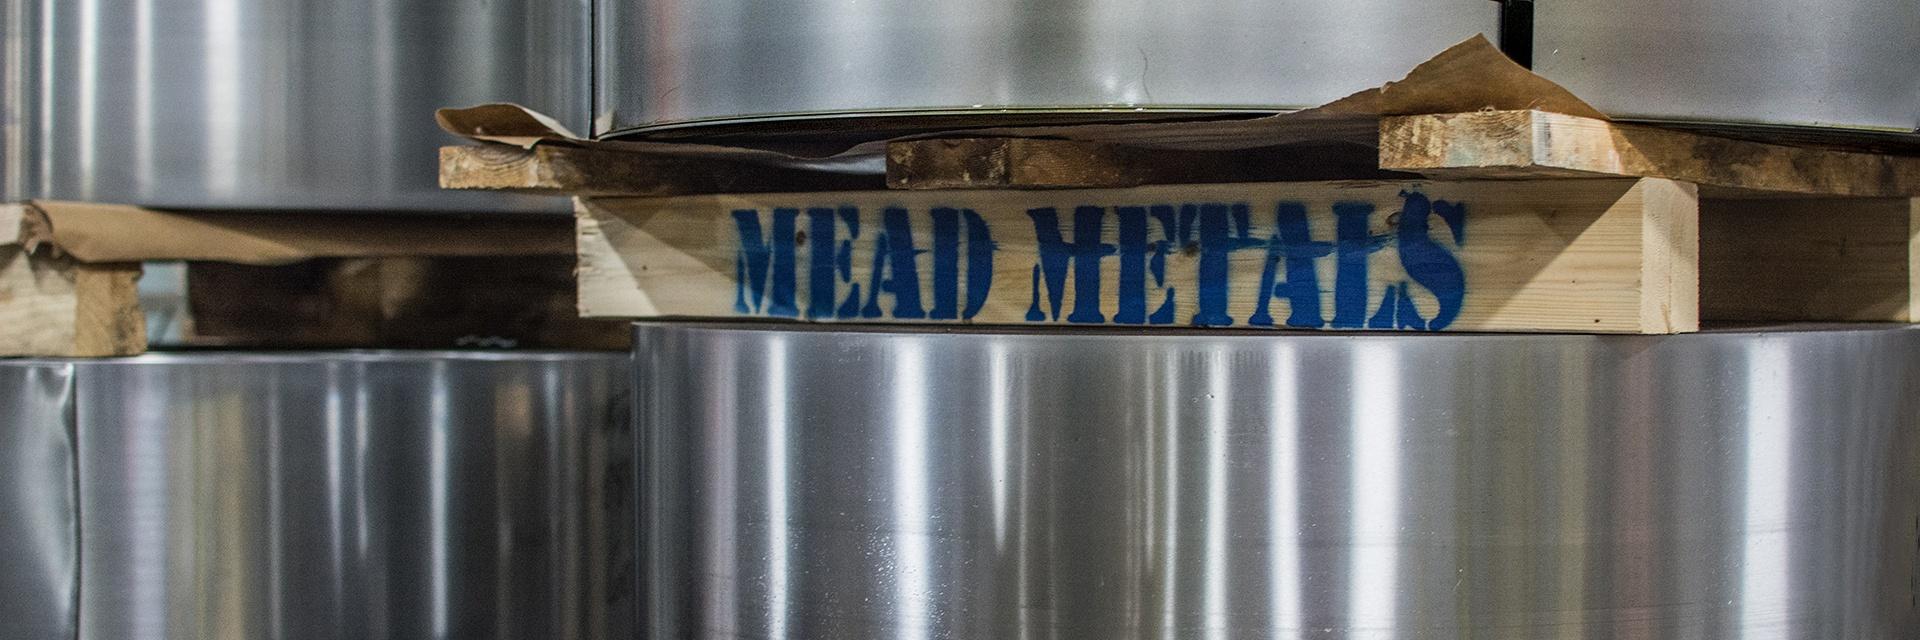 301, 302, and 304 Stainless Steel Metal Properties